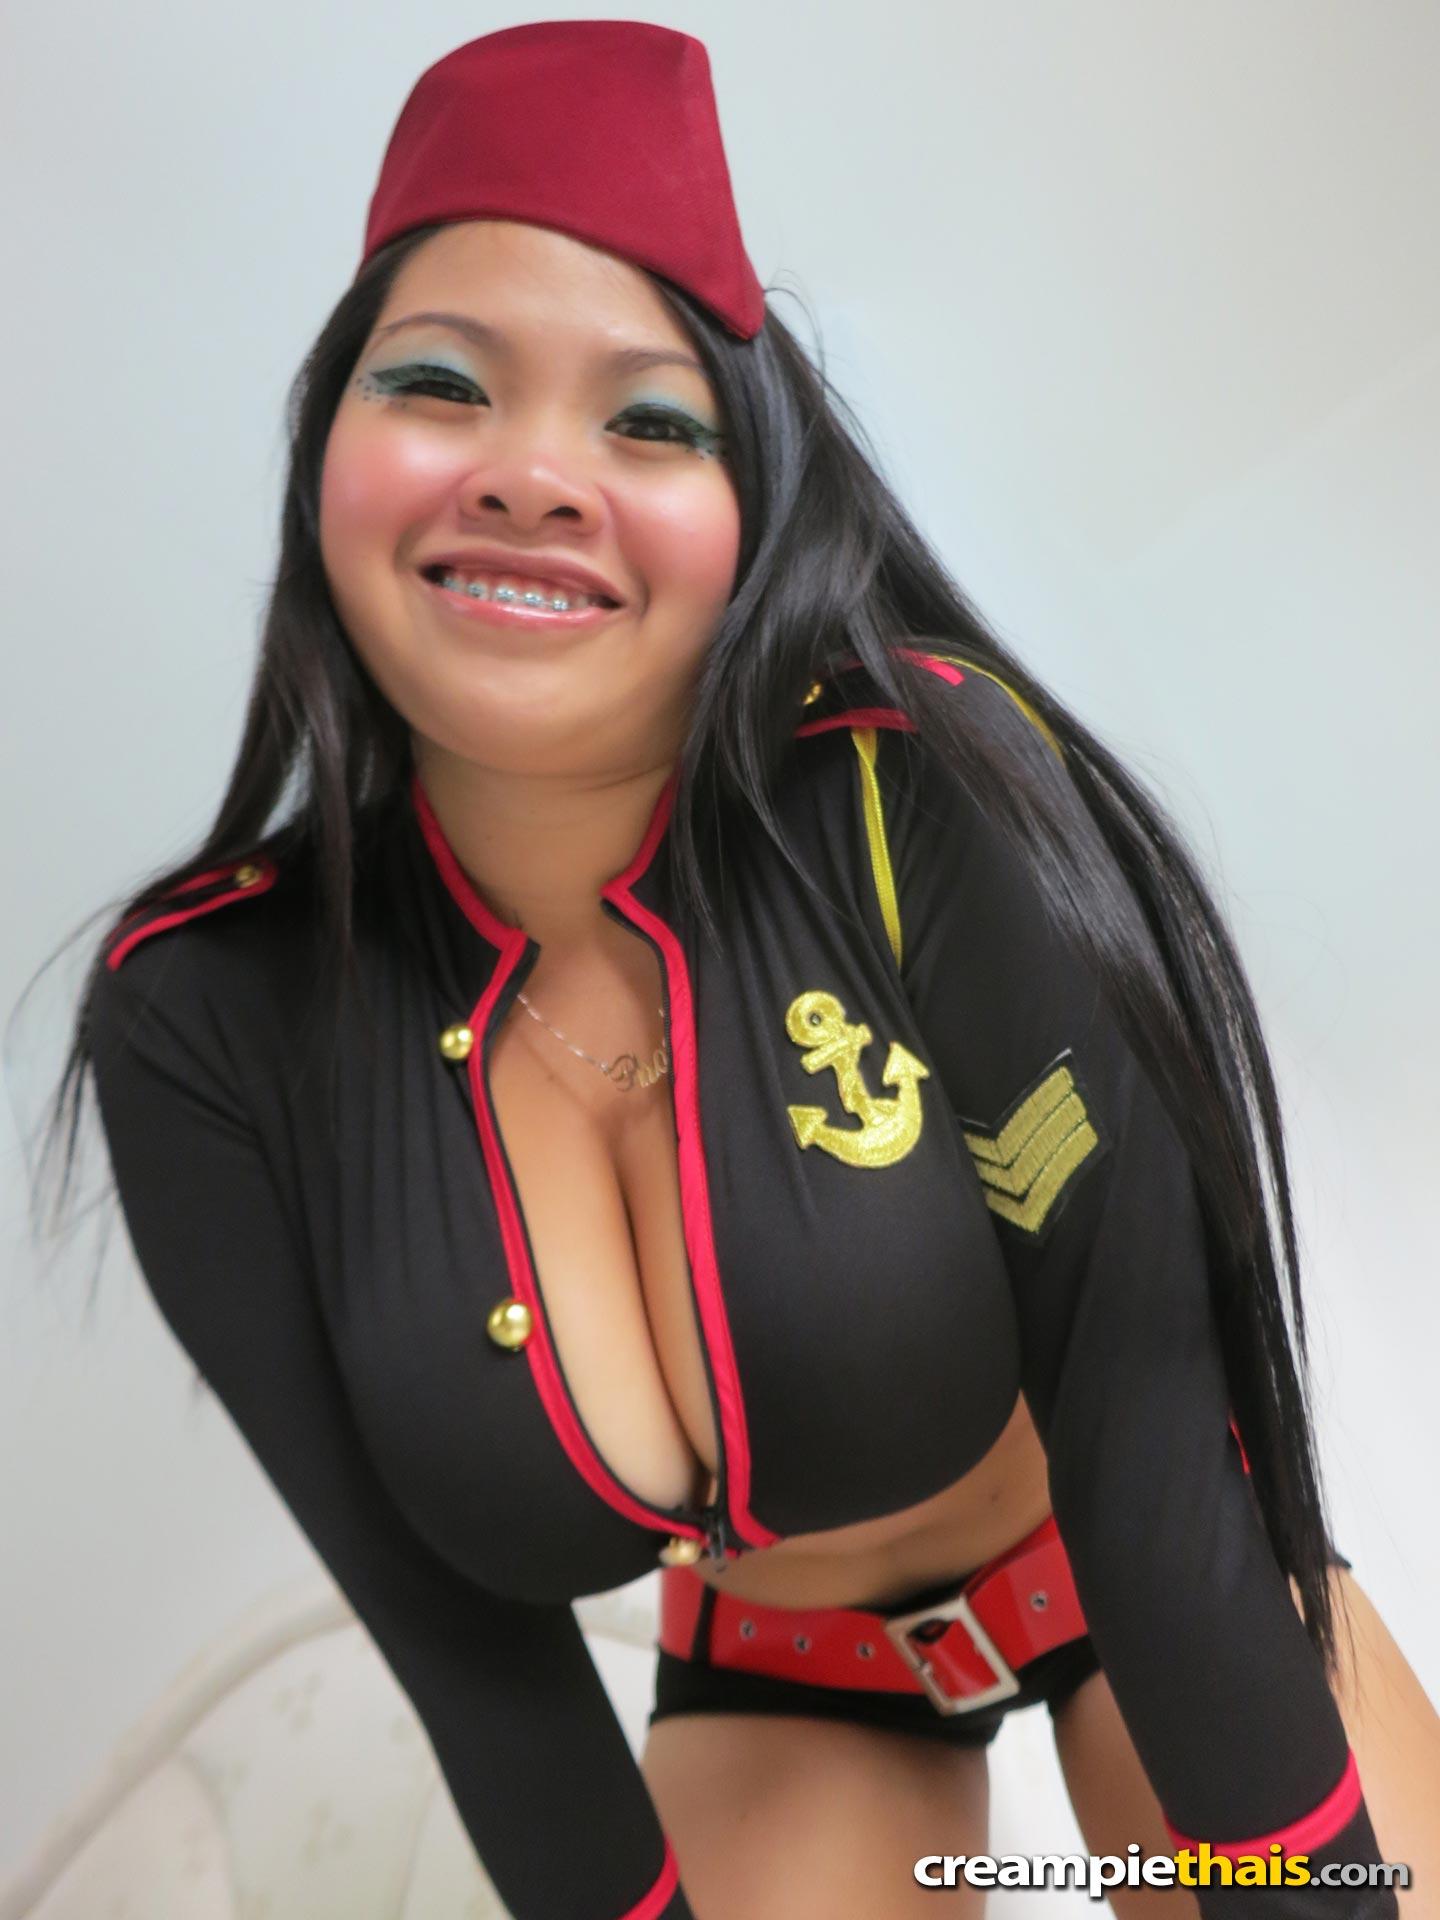 Phoebi thai chubby girl congratulate, seems